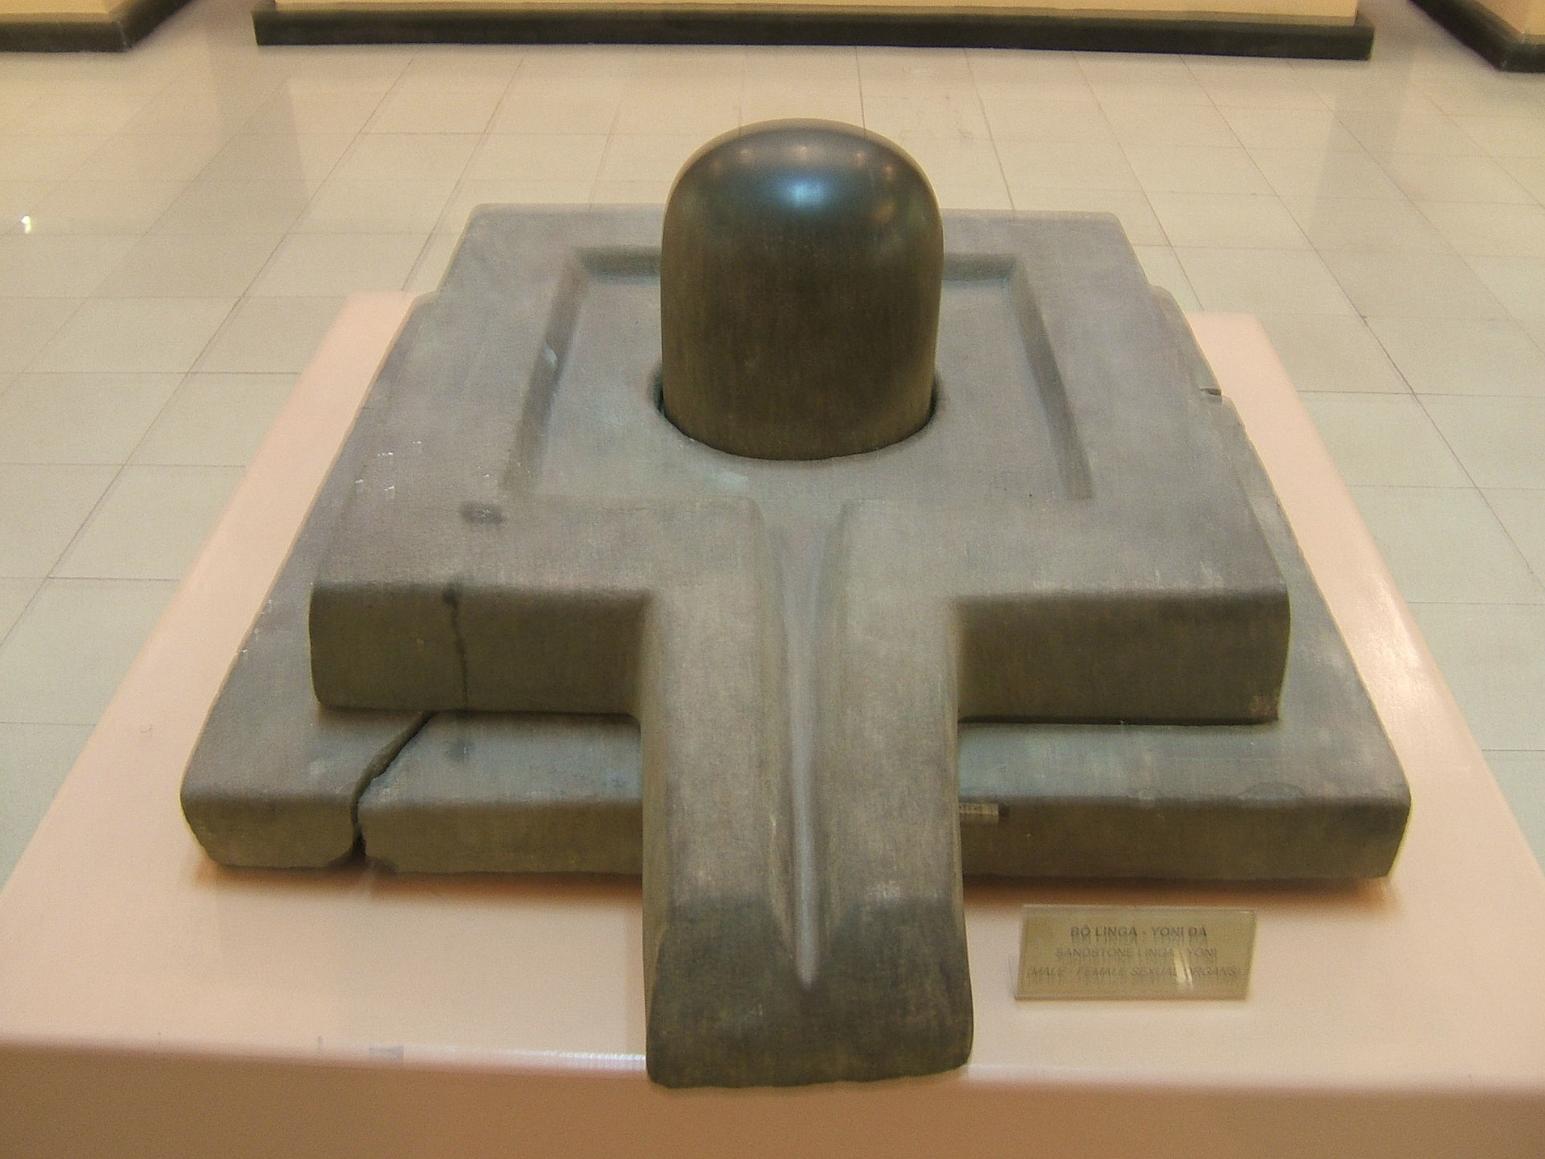 Linga-Yoni at the Vietnam National Museum